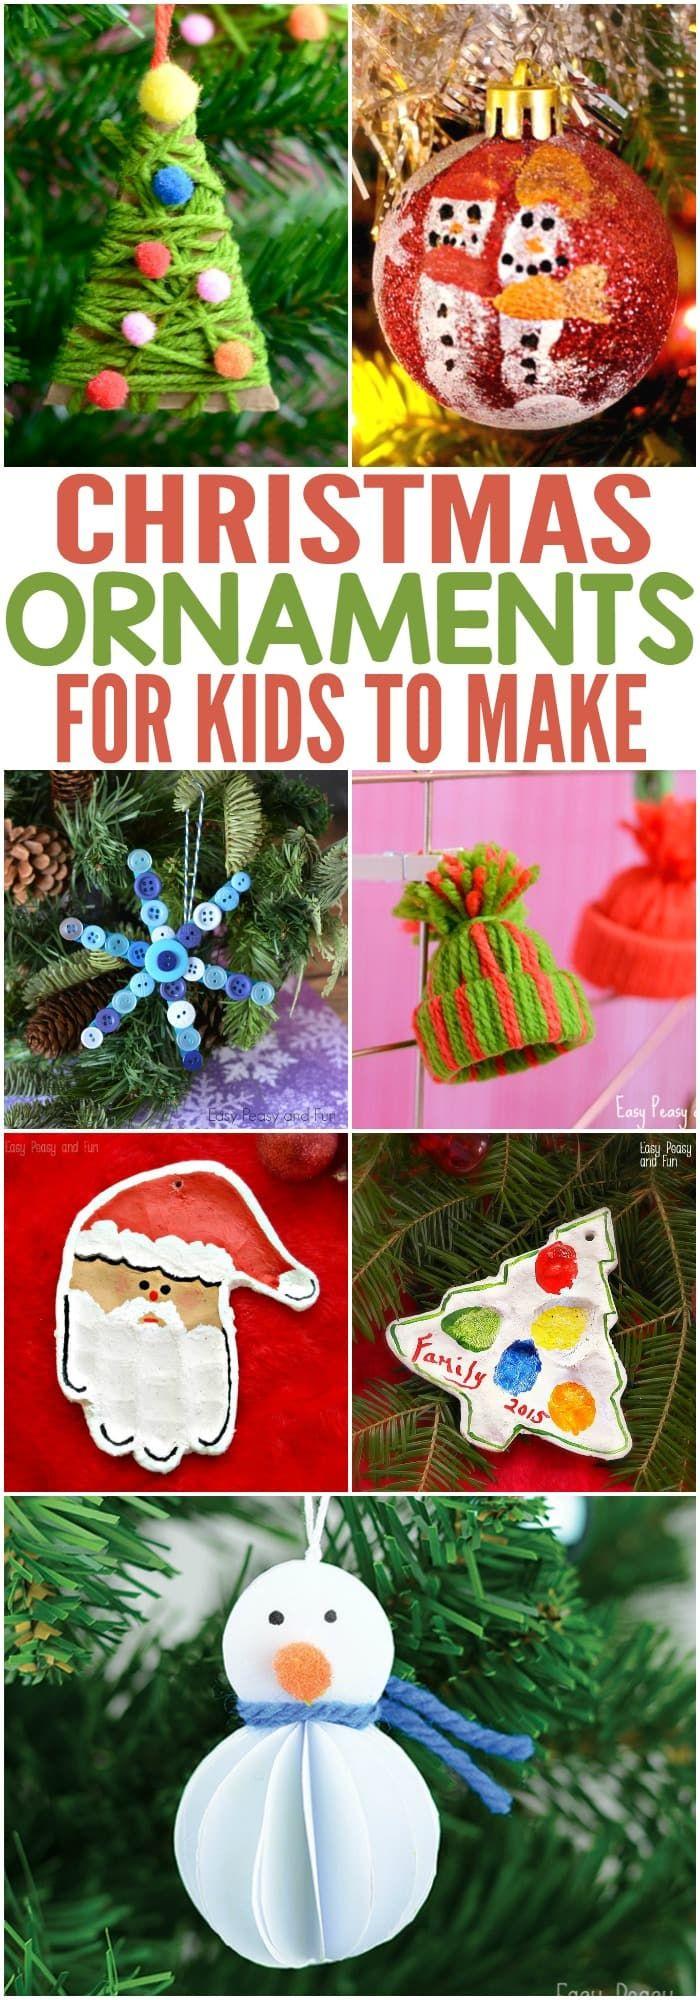 Jolly DIY Christmas Ornaments Ideas - Homemade Memories for Kids